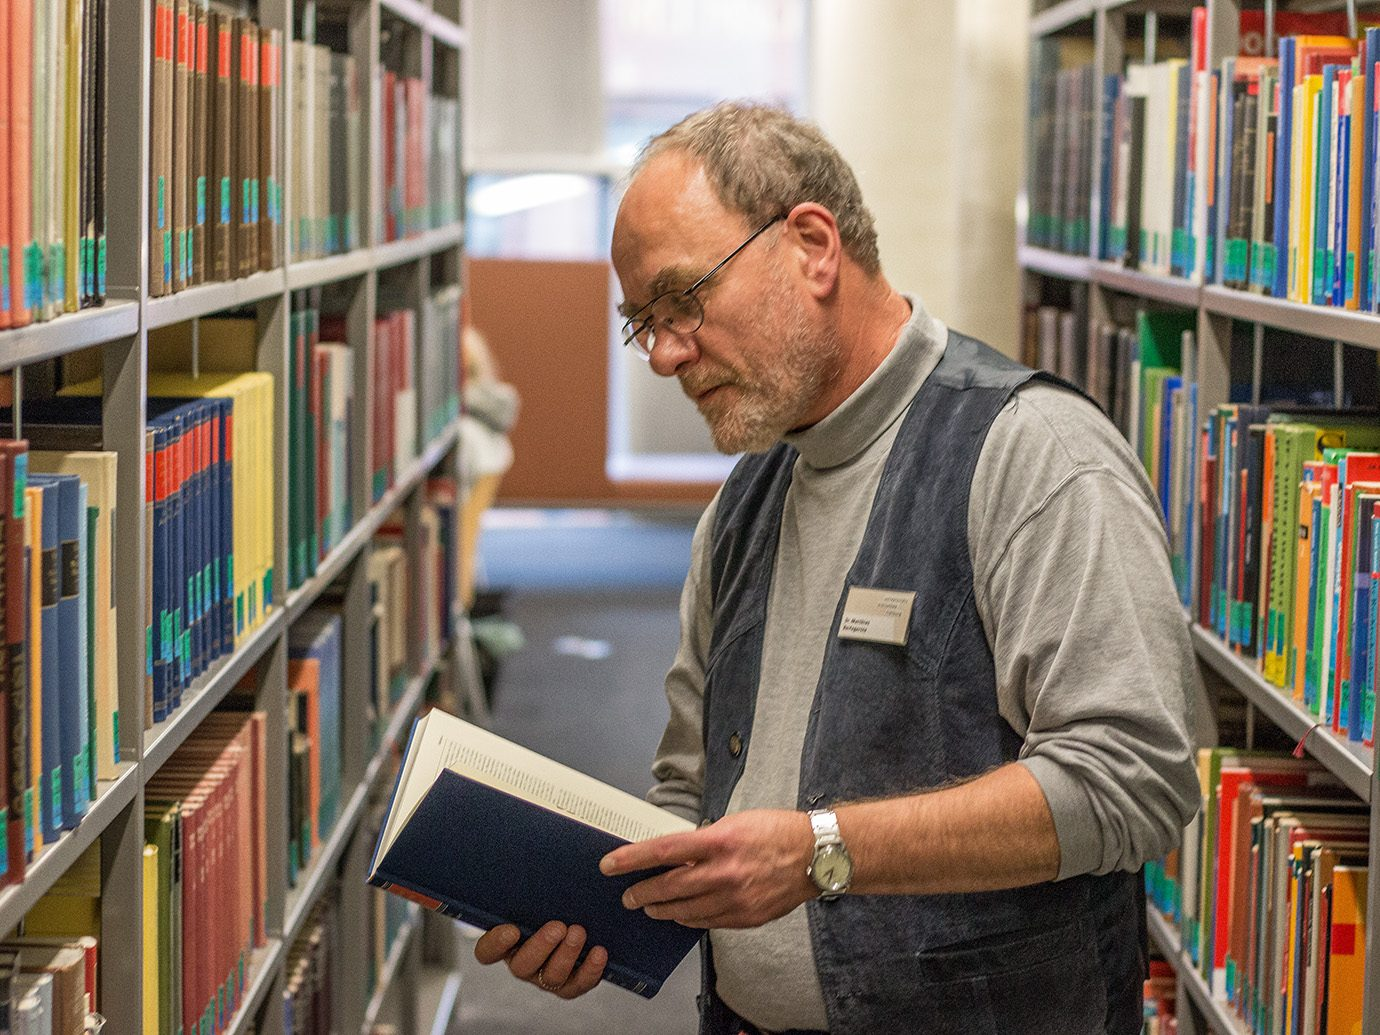 Dr. Matthias Reifegerste